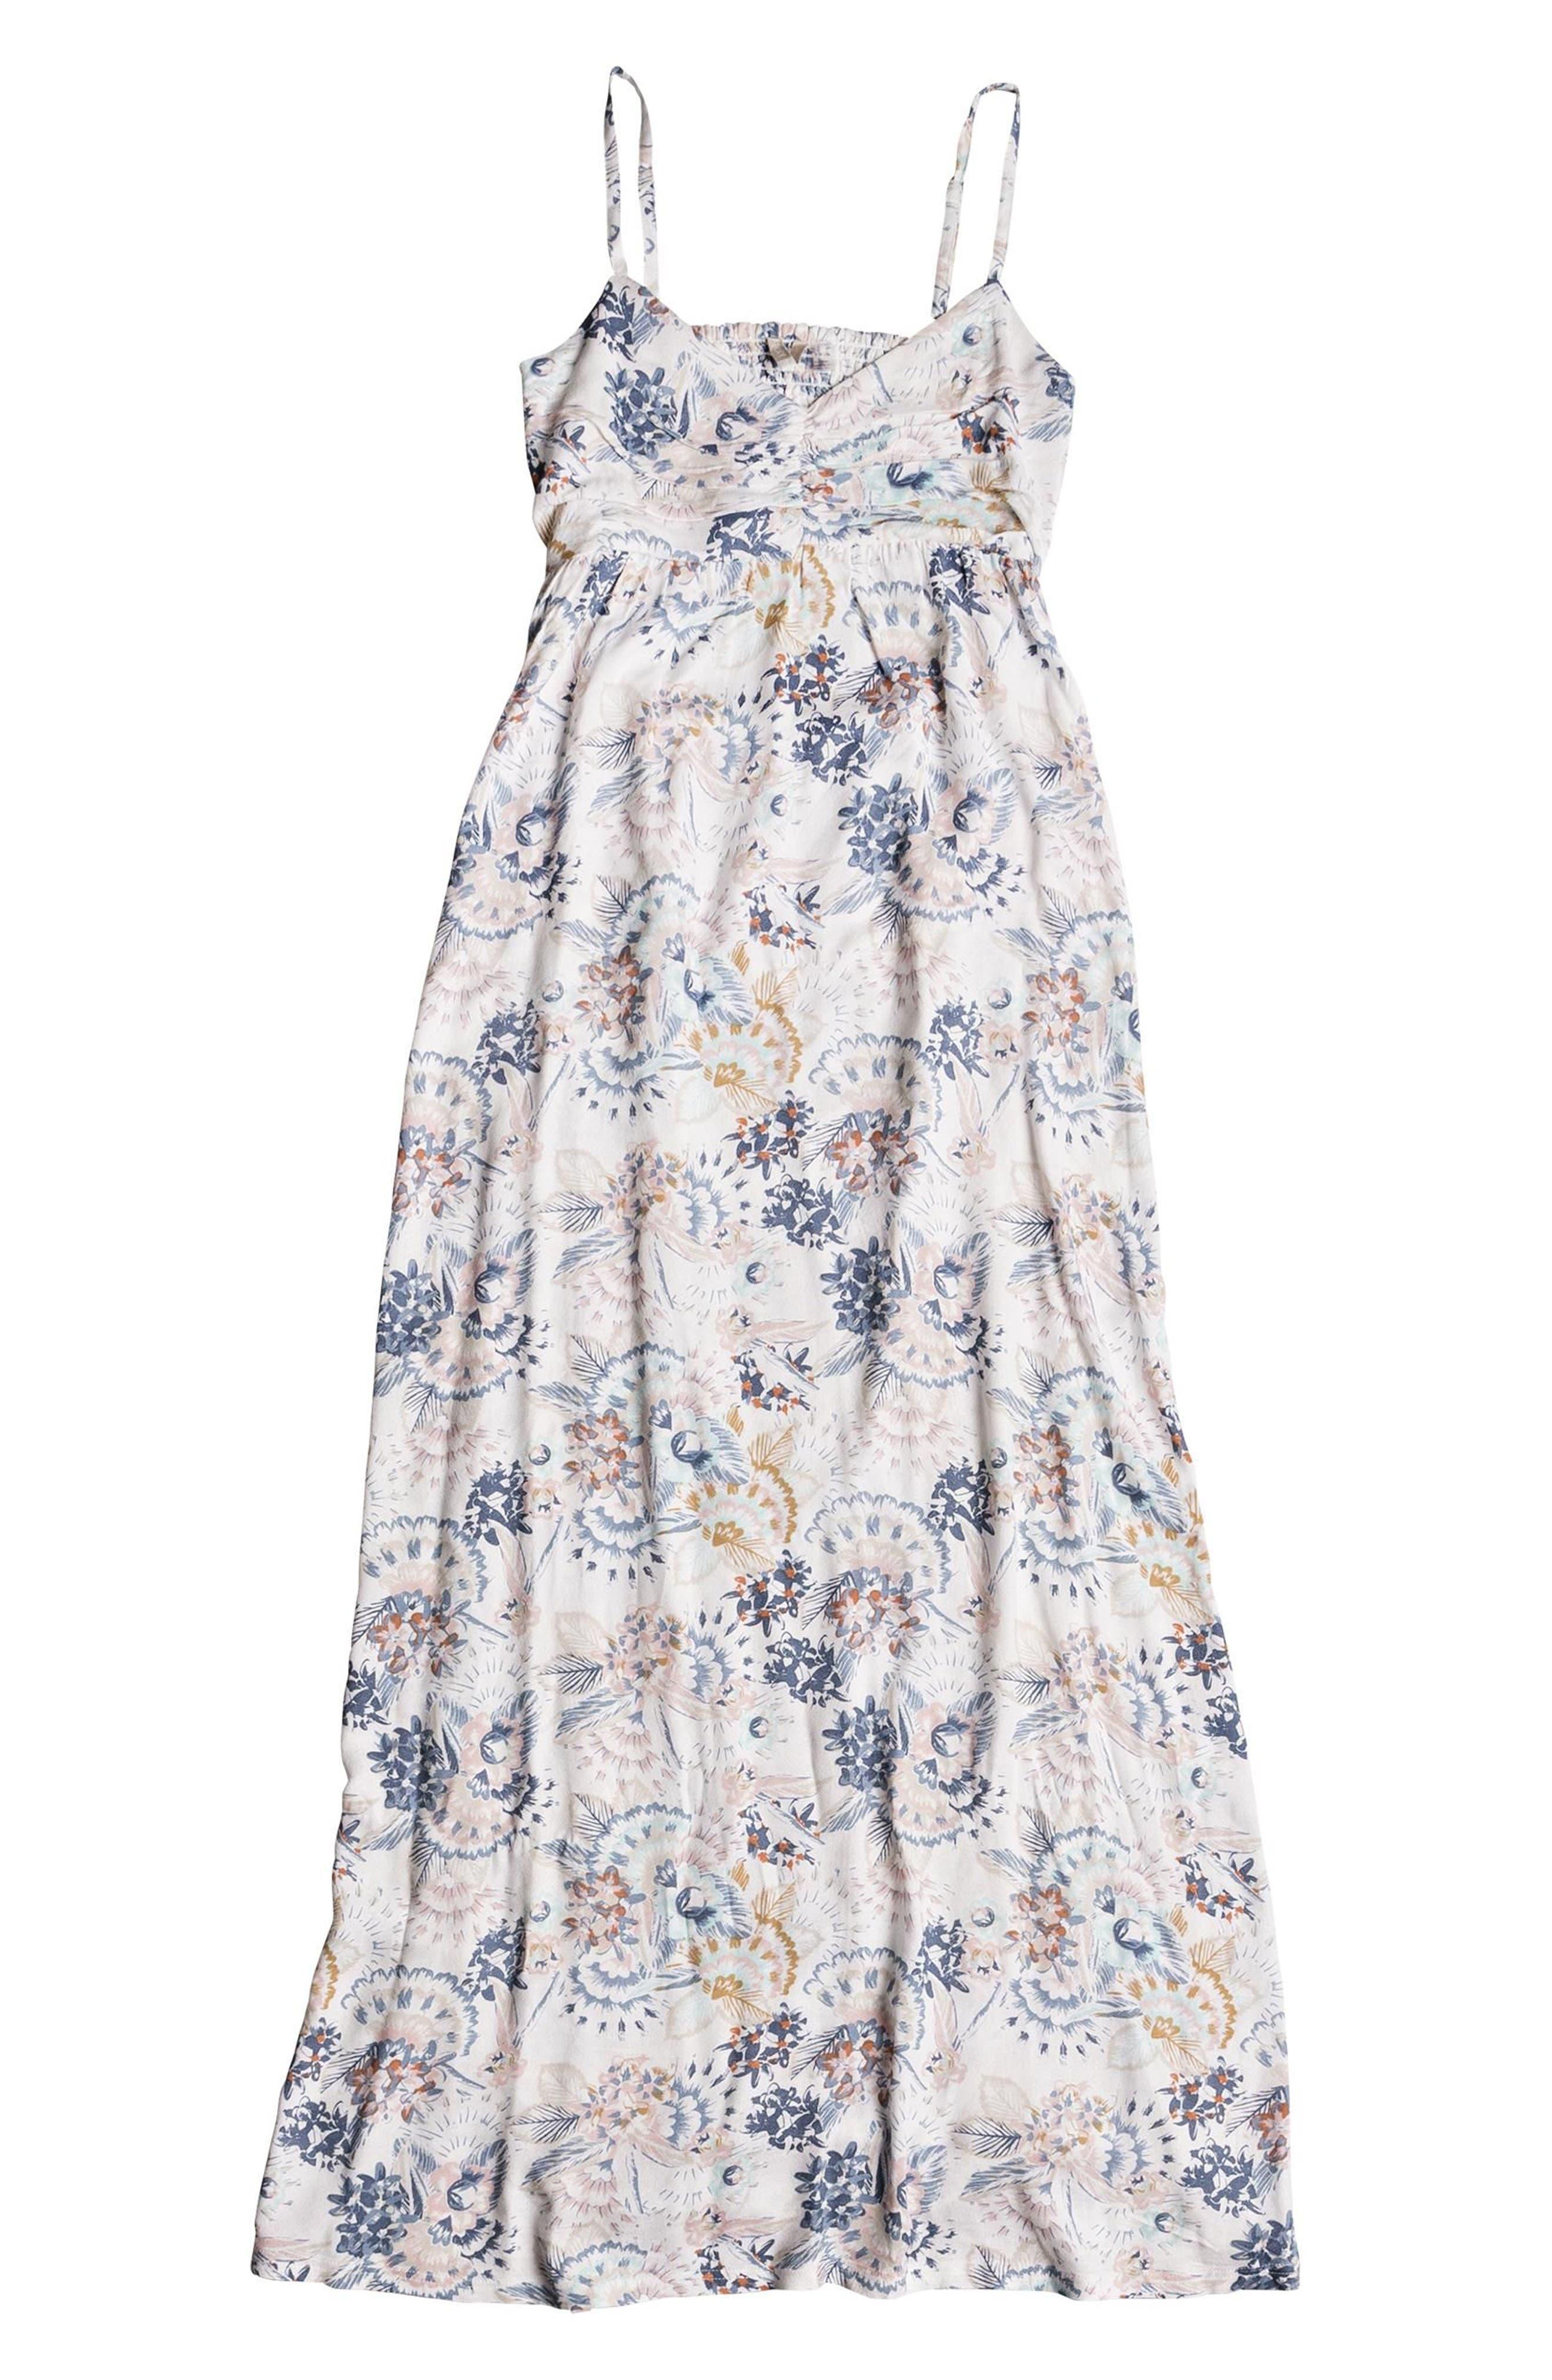 ROXY,                             Brilliant Stars Maxi Dress,                             Alternate thumbnail 4, color,                             900